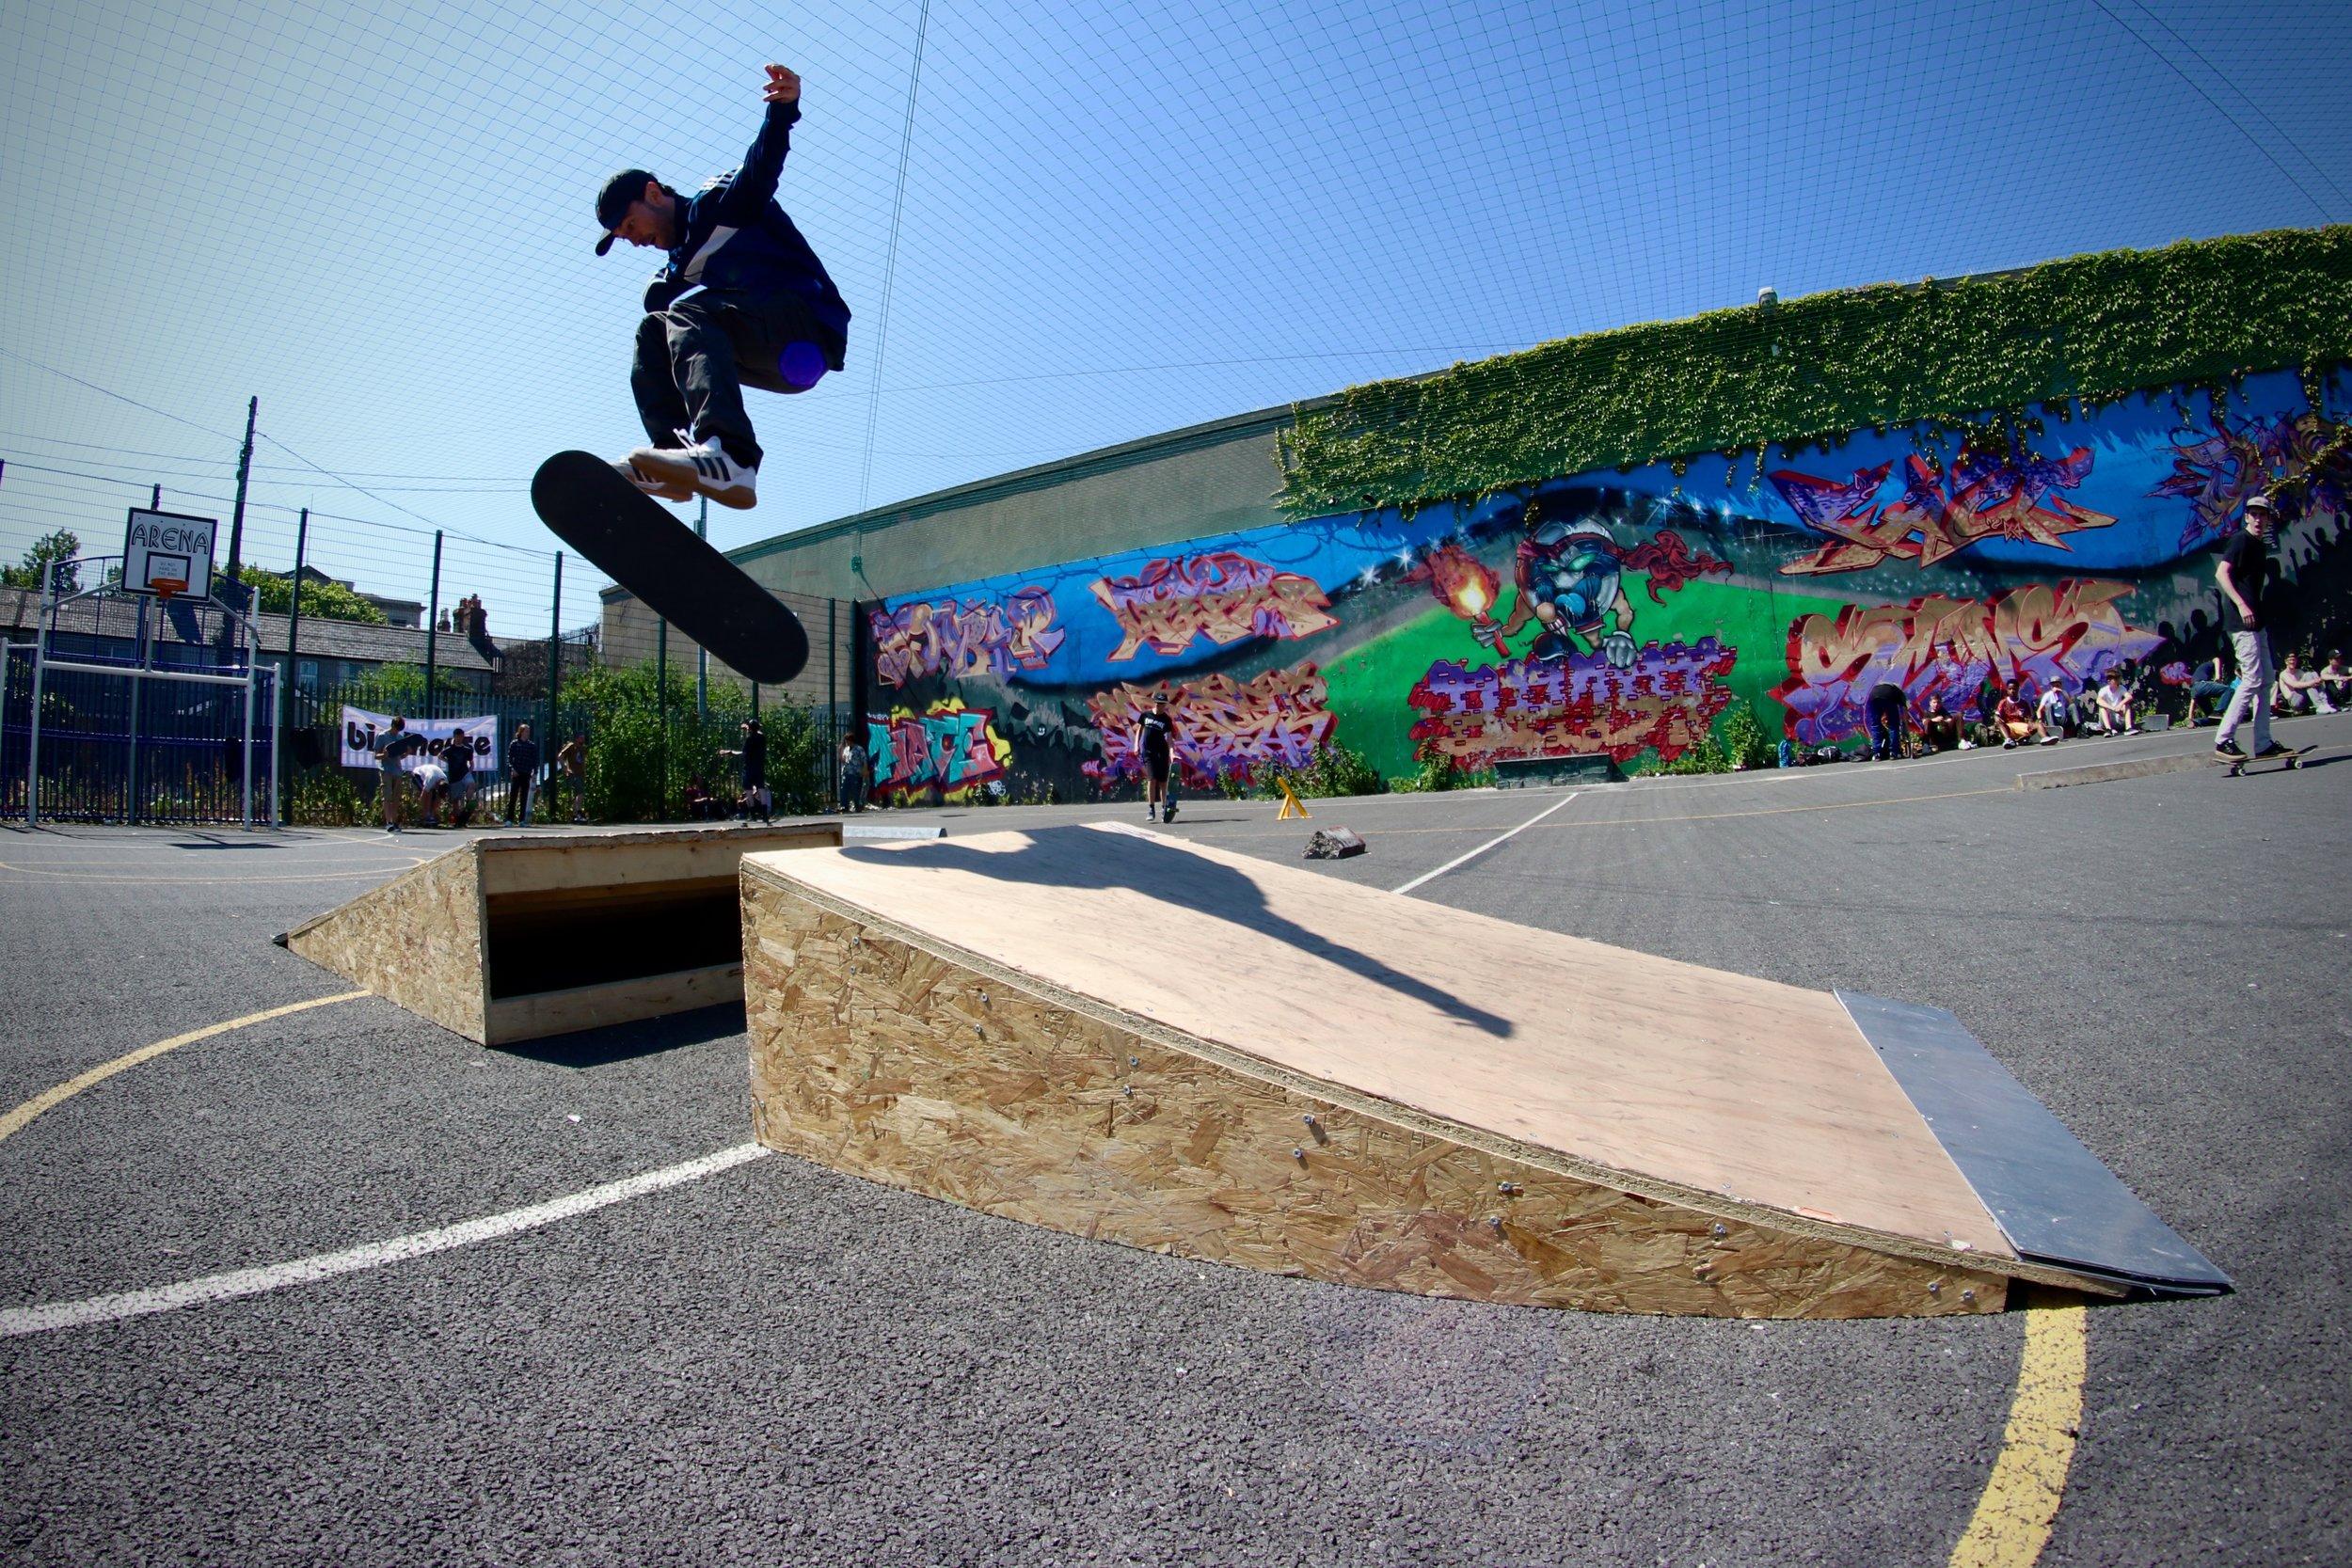 Dion McGarrity - Nollie 360 Flip (@dionmcg_90)